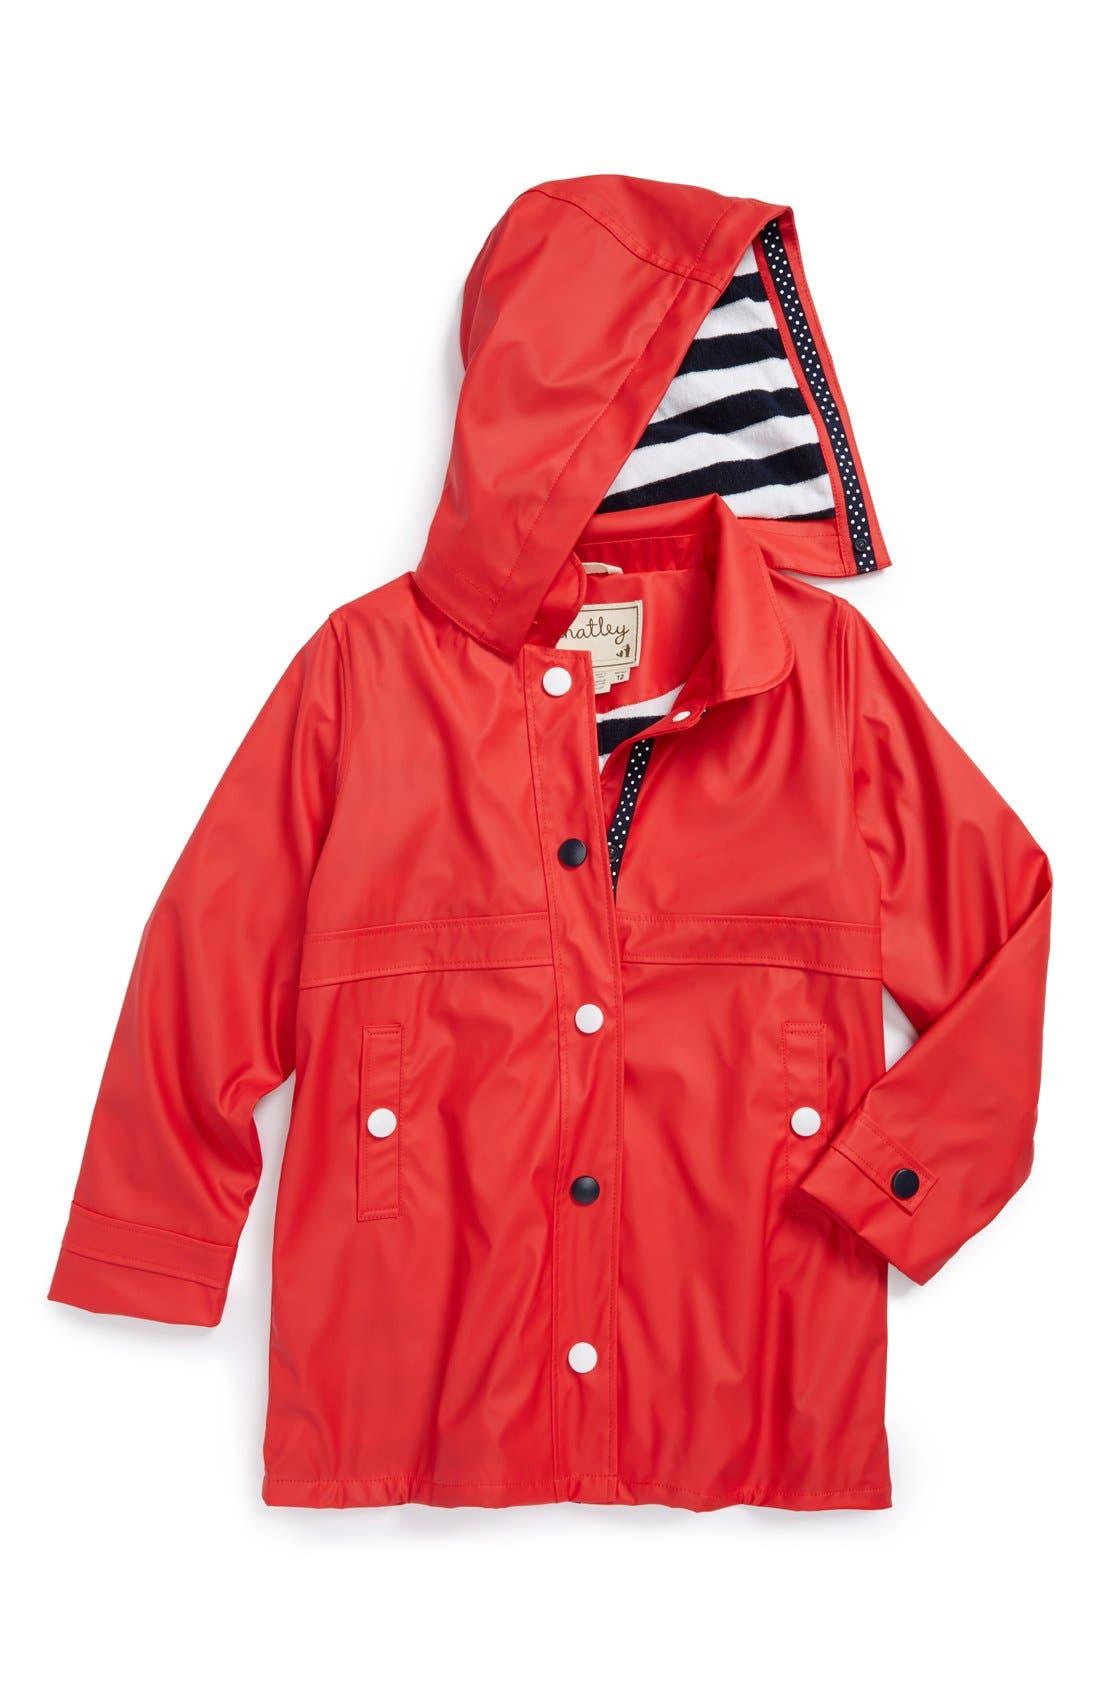 'Splash' Terry Lined Waterproof Rain Jacket,                         Main,                         color, Red